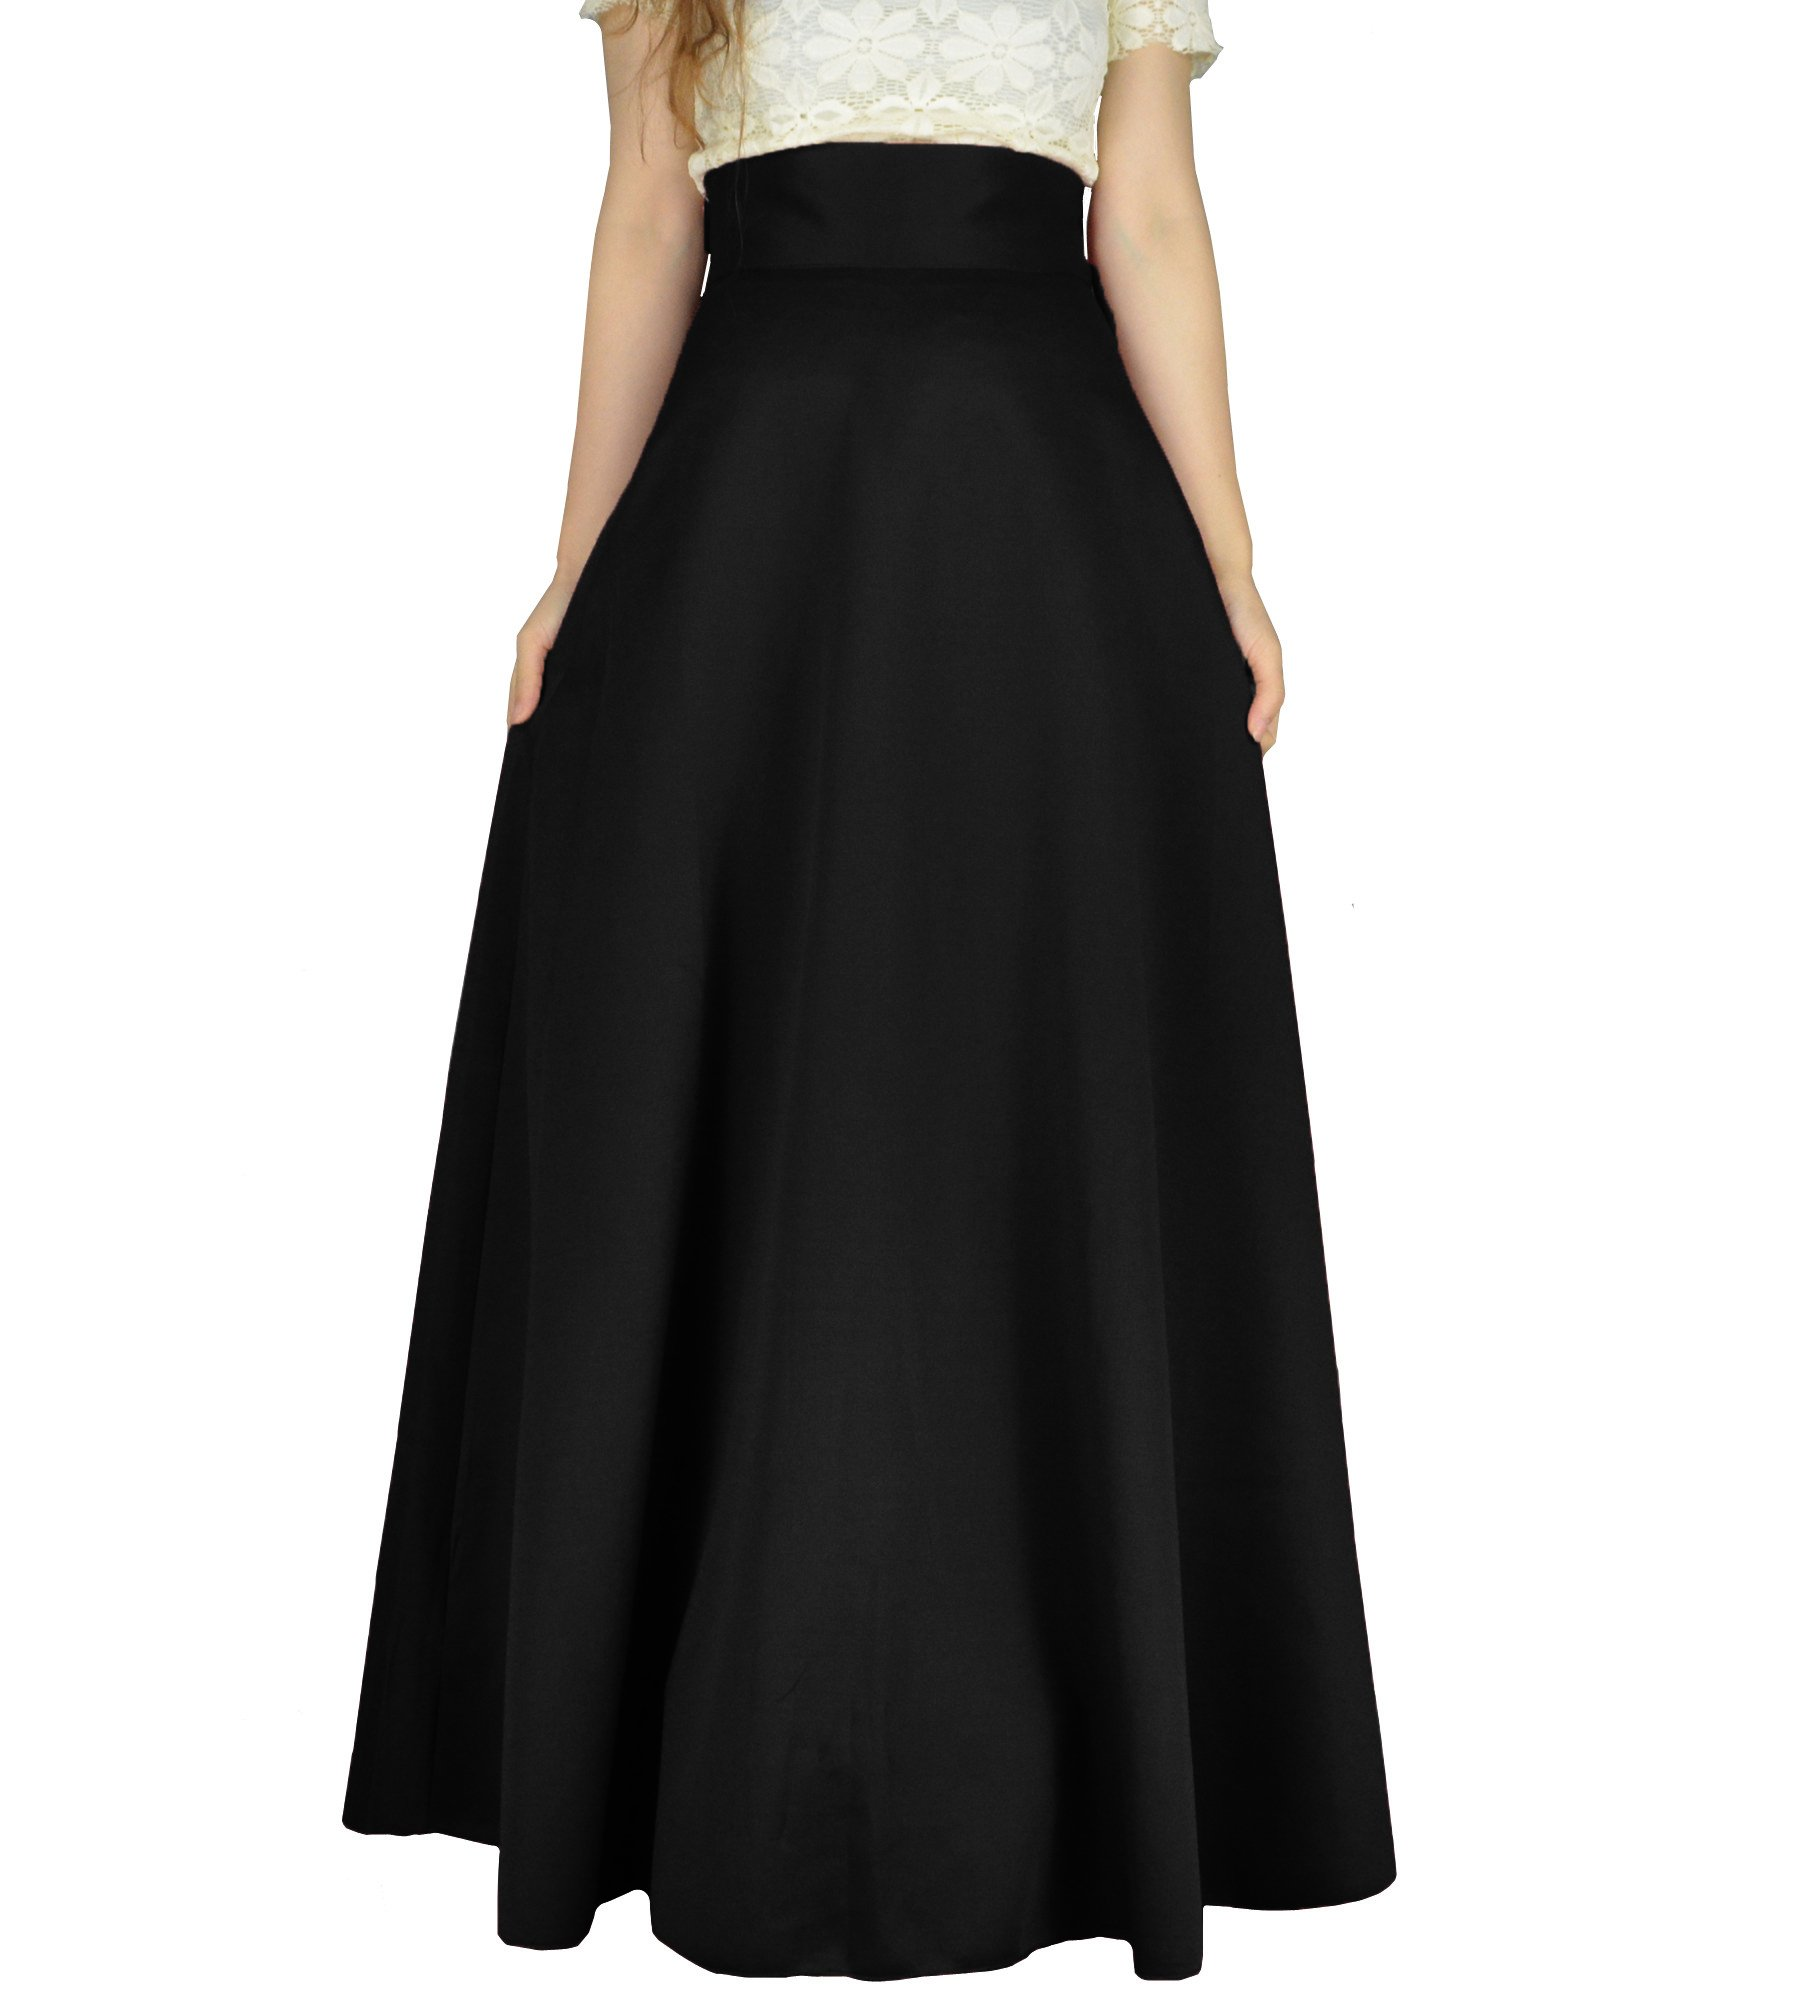 YSJERA Women's High Waist A-Line Pleated Solid Vintage Swing Maxi Skirts Midi Skirt Party (14 Plus, Black Long) by YSJERA